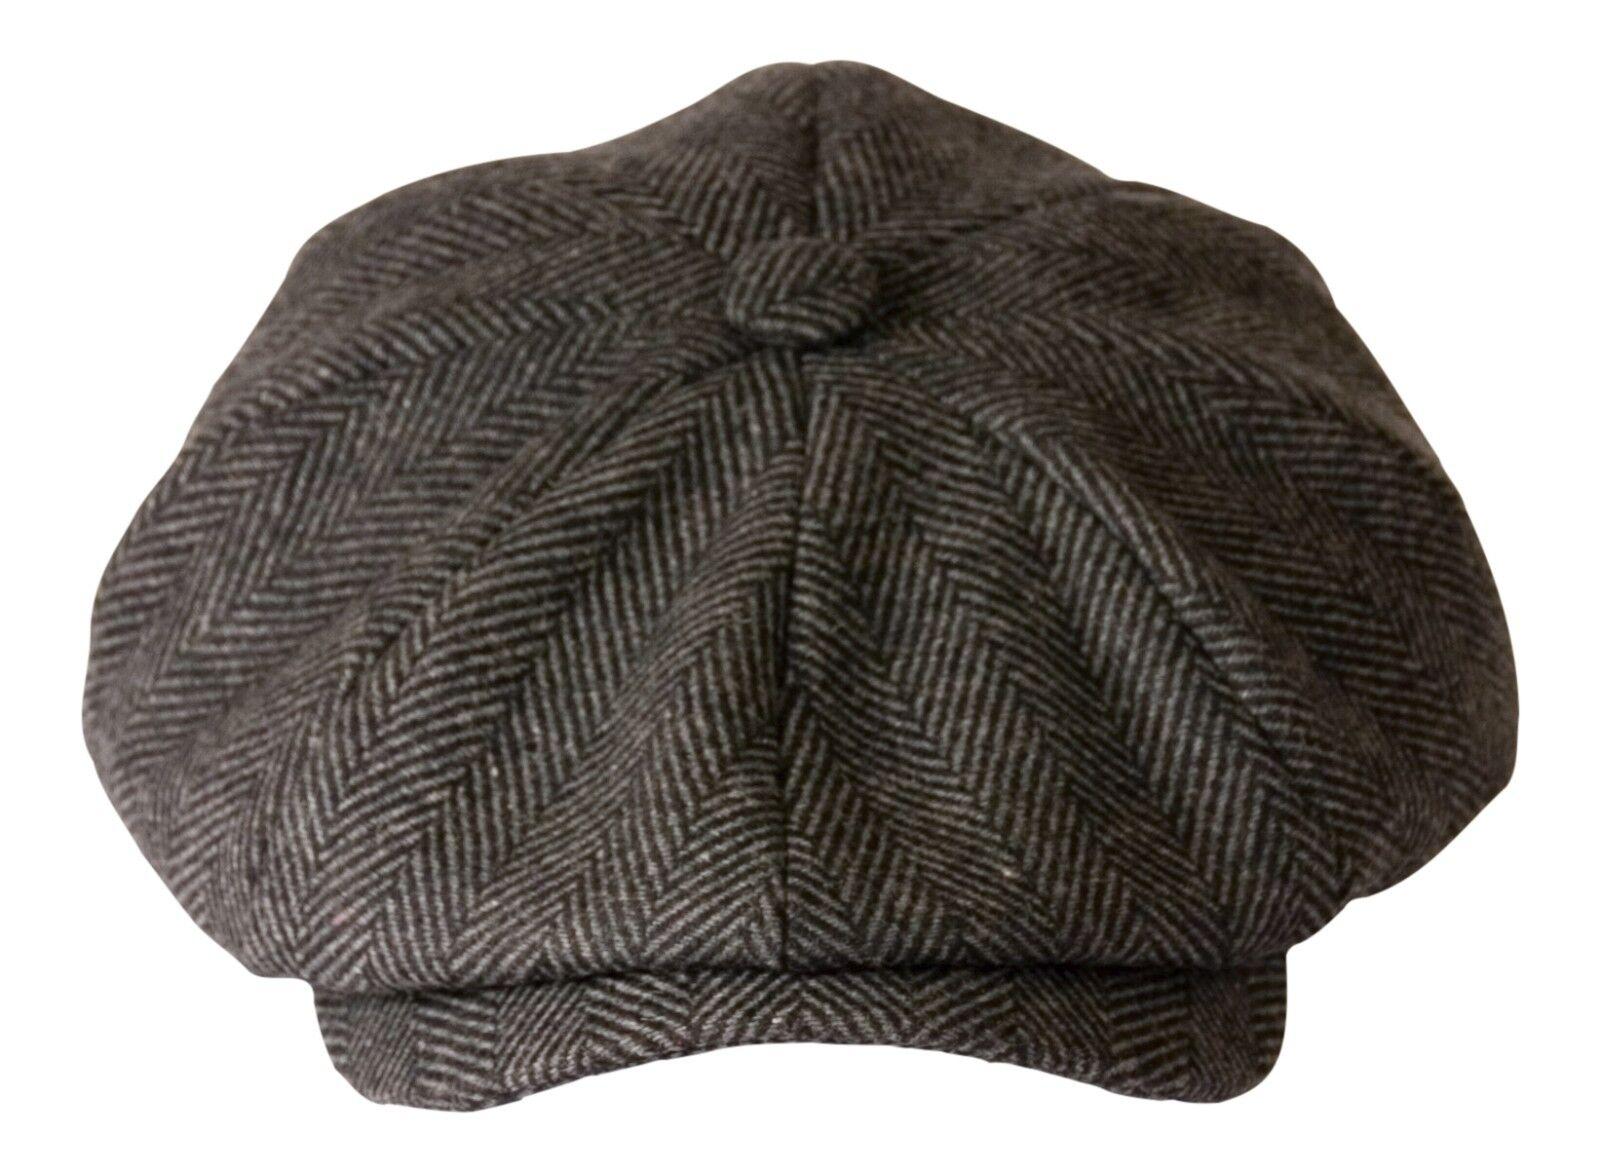 88976eec0cf2b  shelby  Grey Herringbone Wool Newsboy Button Top Flat Cap by Gamble   Gunn  XXXL 65cm for sale online